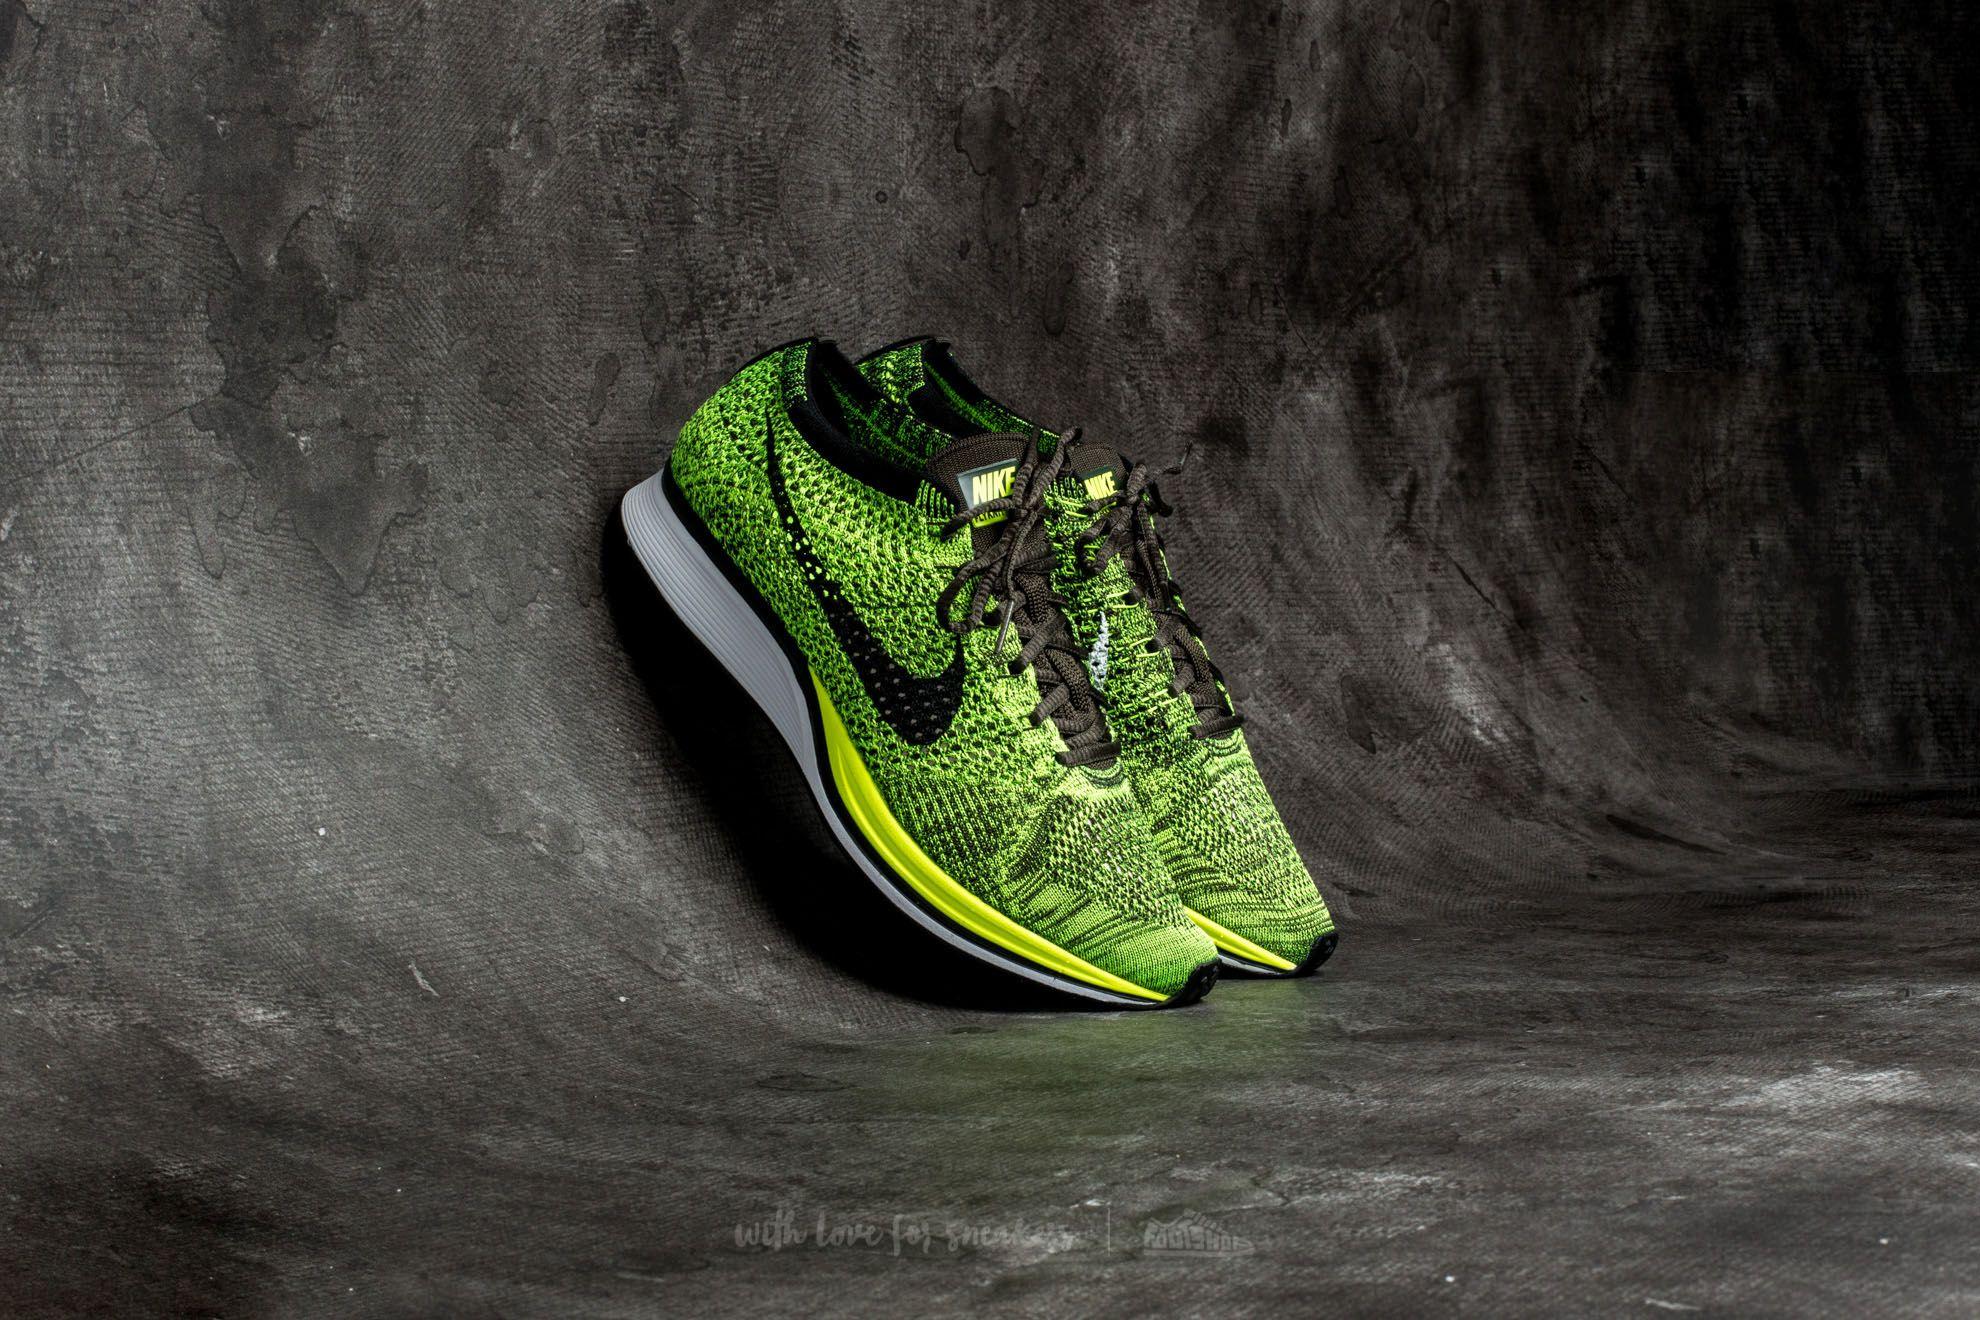 Nike Flyknit Racer Volt/ Black-Sequoia